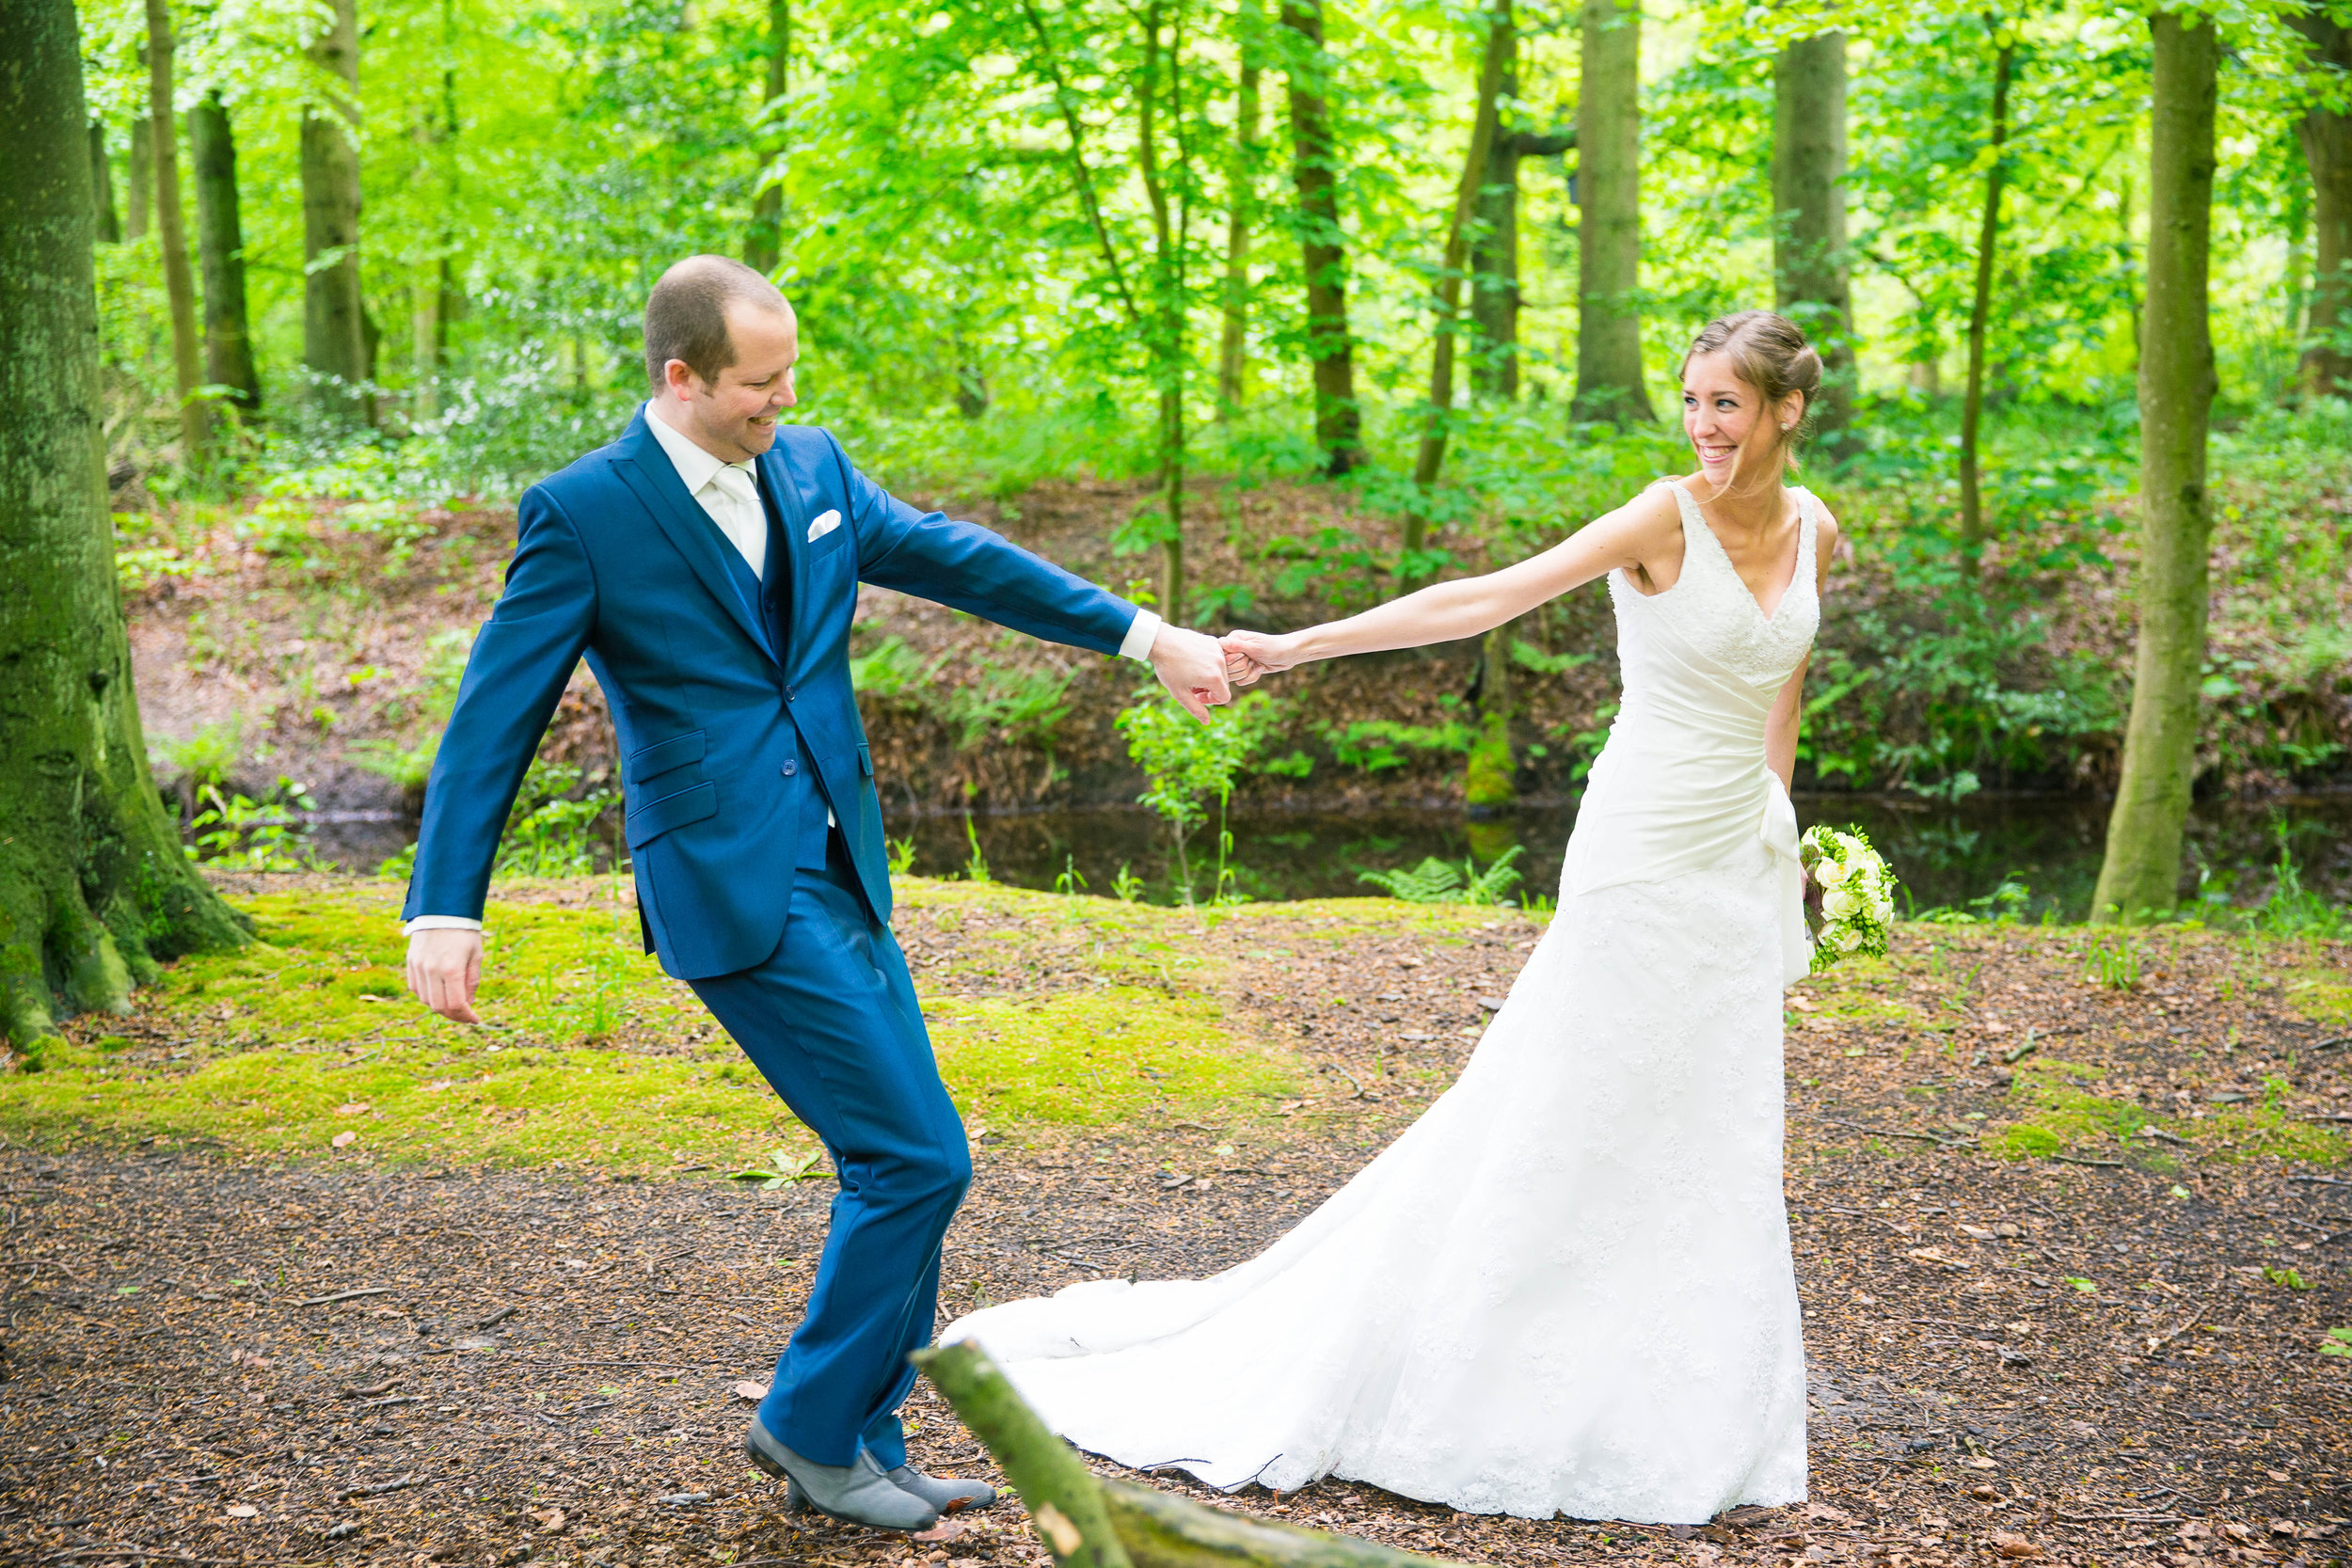 bruidsfotografie-trouwreportage-huwelijksfotografie-bruidsfotograaf-feestfotografie-Elise en Maarten-132.jpg